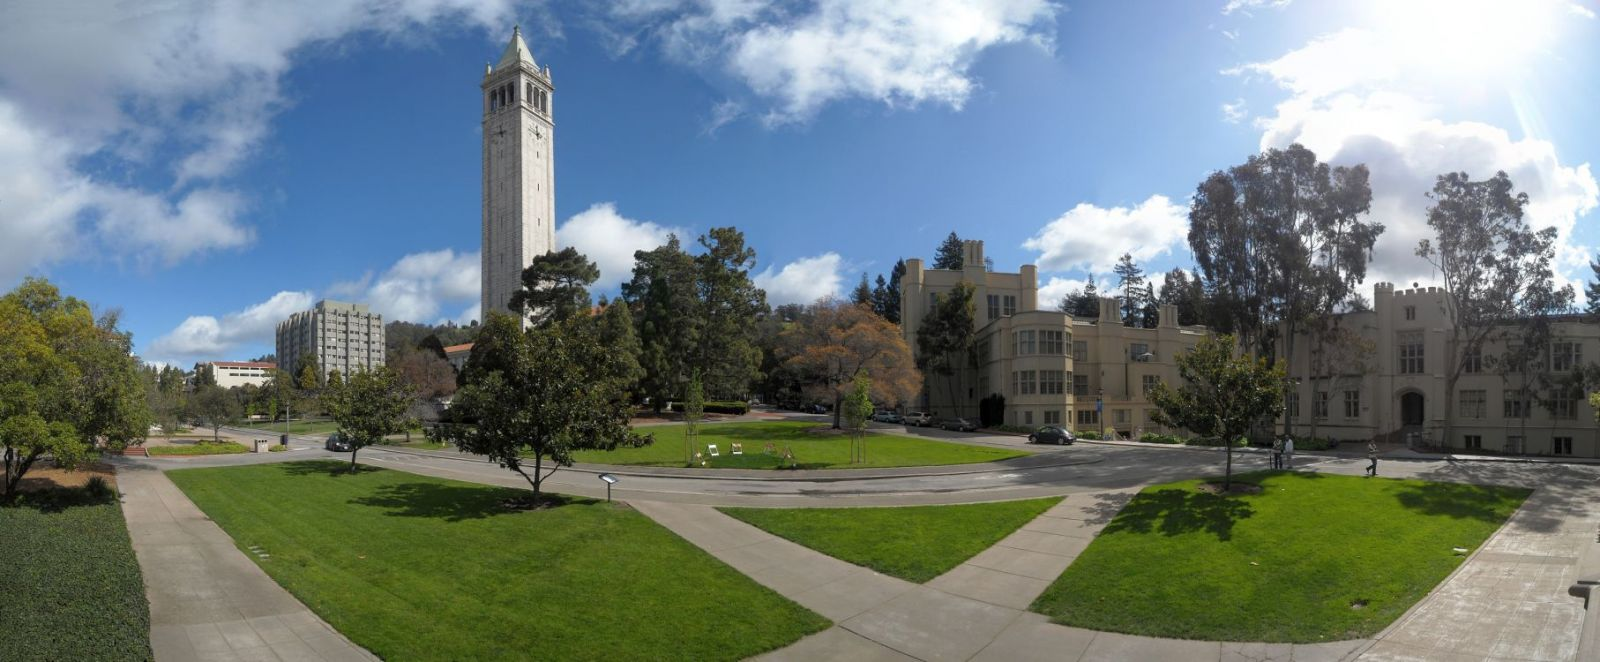 Uc Berkeley Tour Guide Application